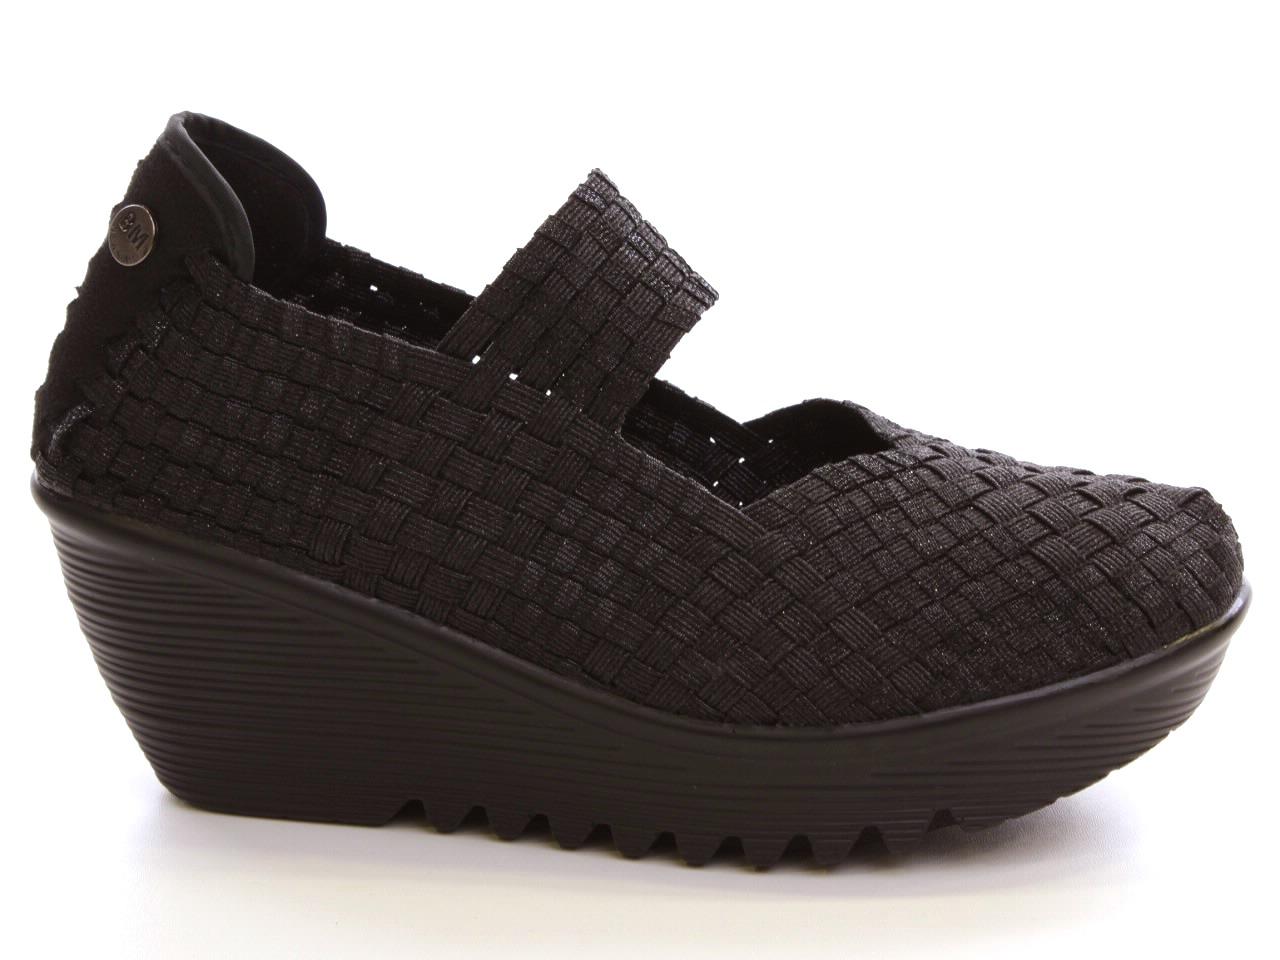 Wedge Shoes Bernie Mev - 632 LULIA